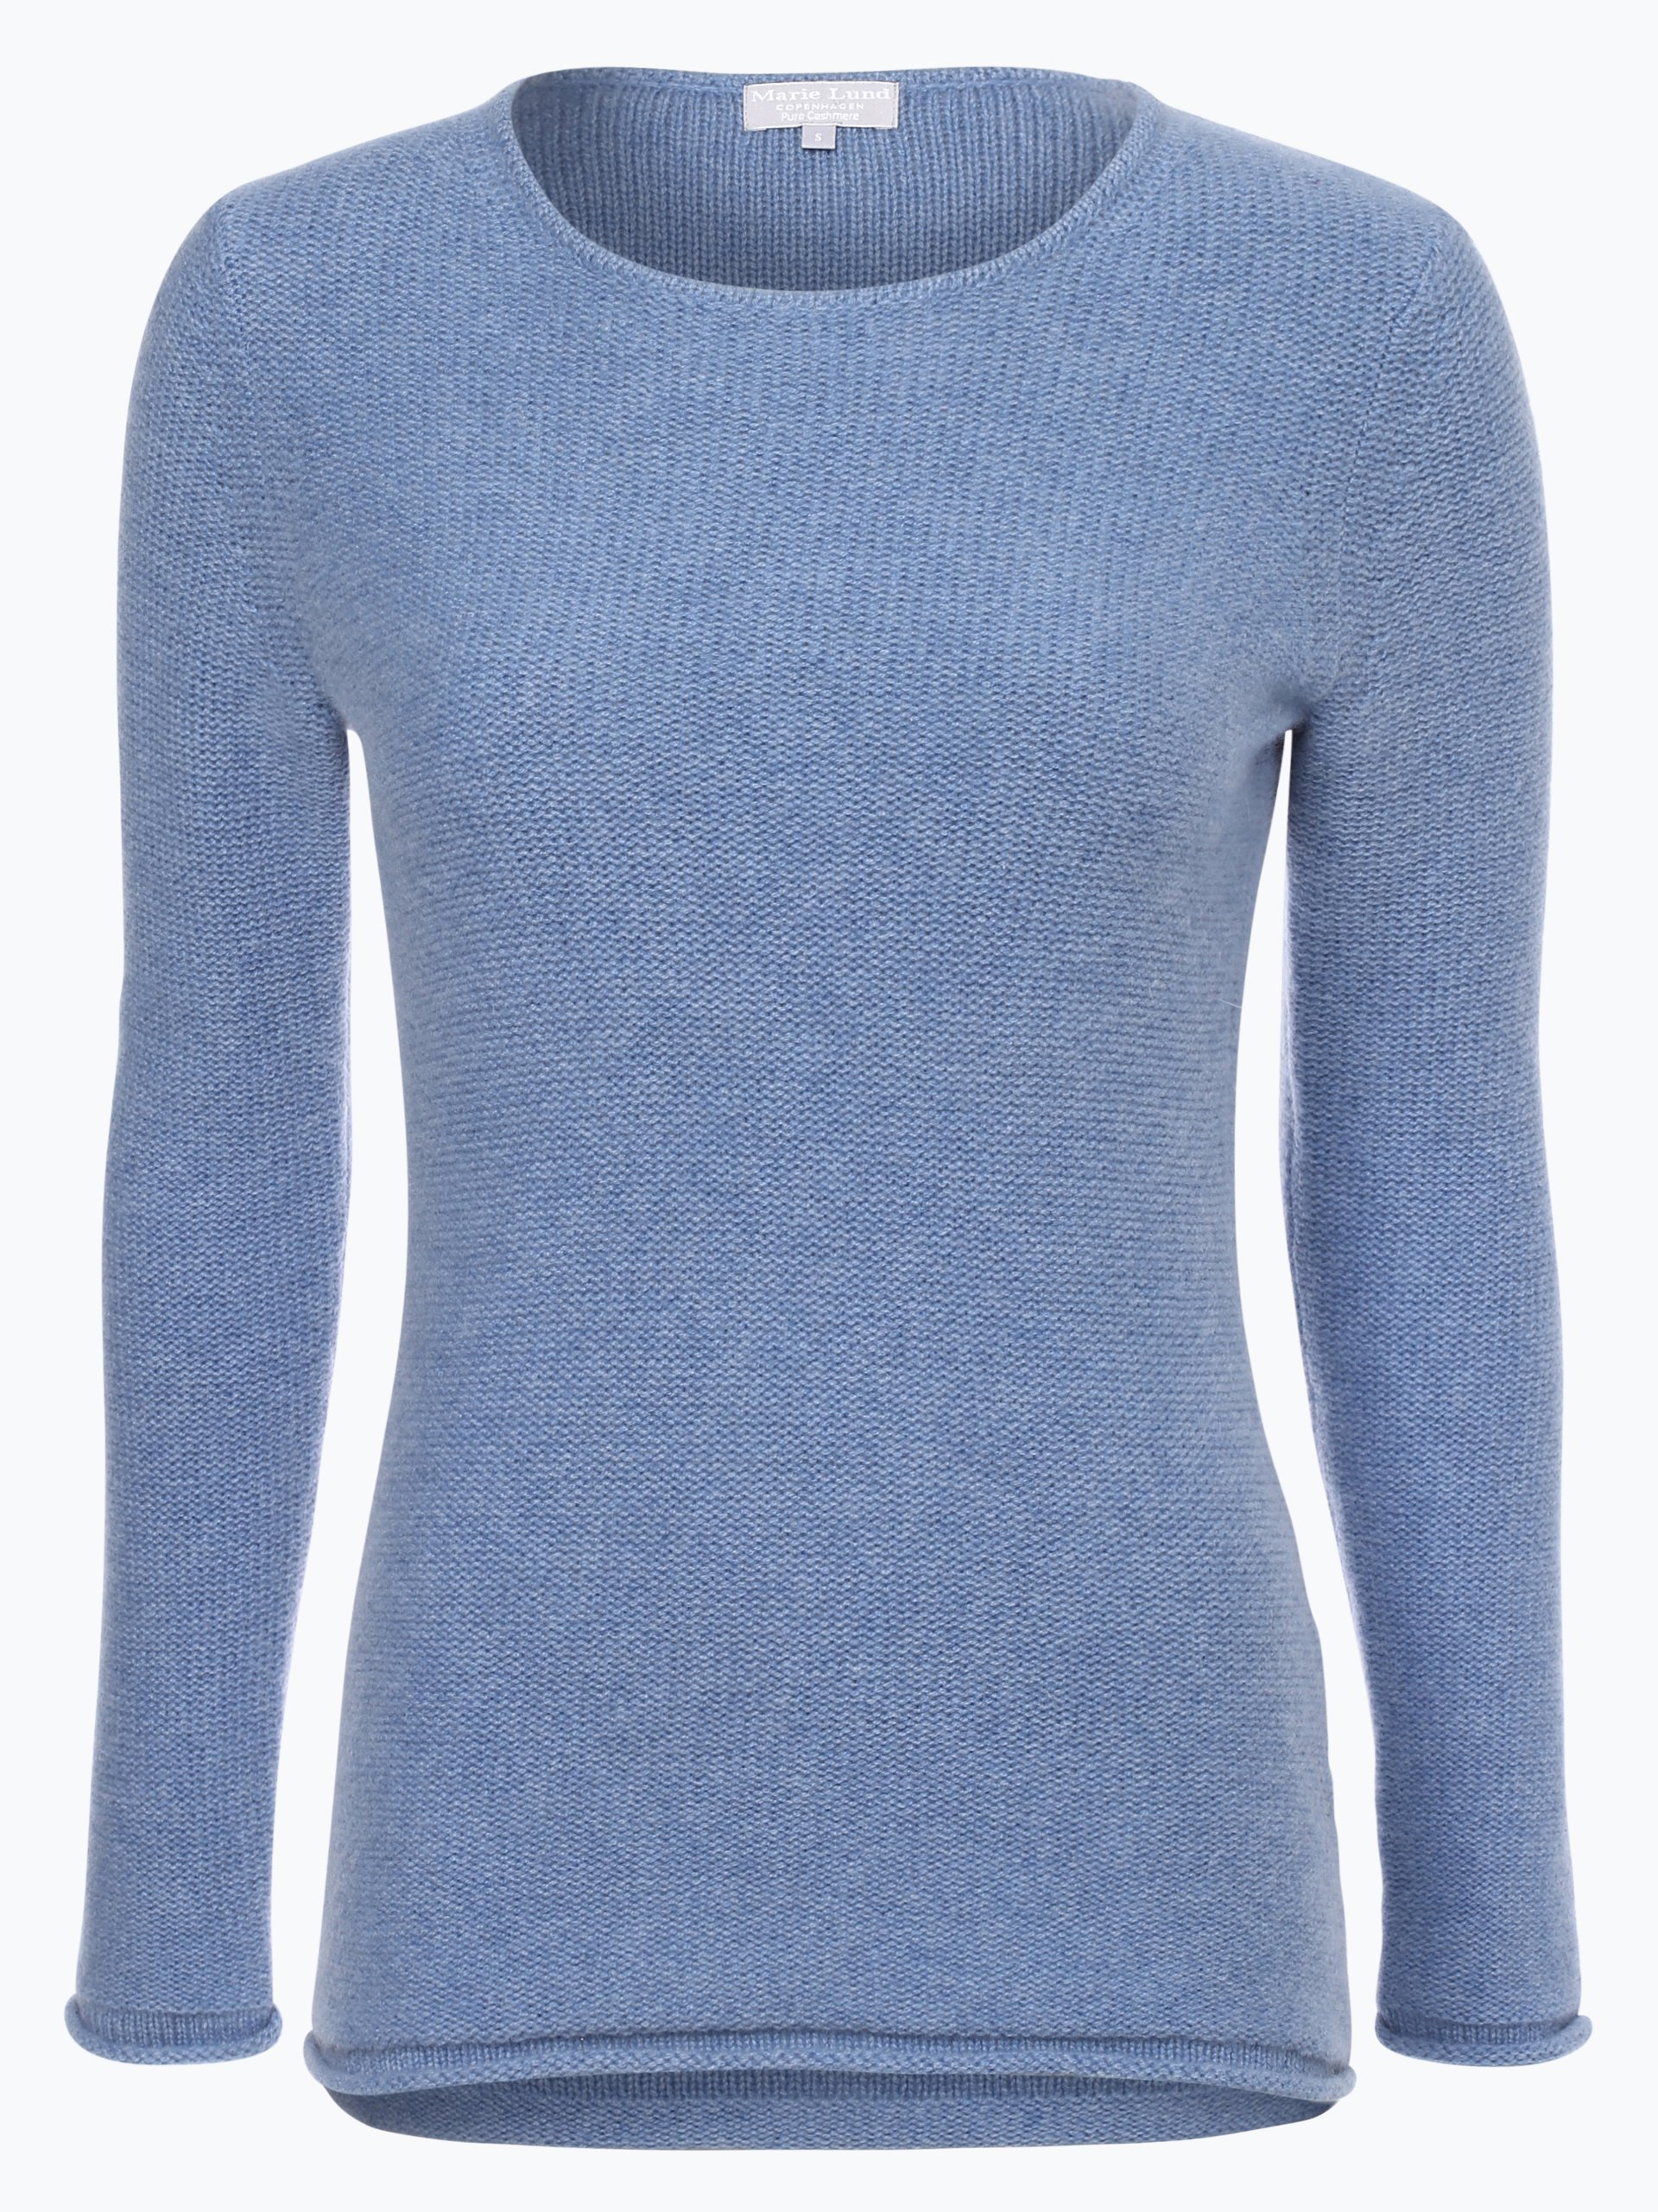 marie lund damen pure cashmere pullover blau uni online. Black Bedroom Furniture Sets. Home Design Ideas